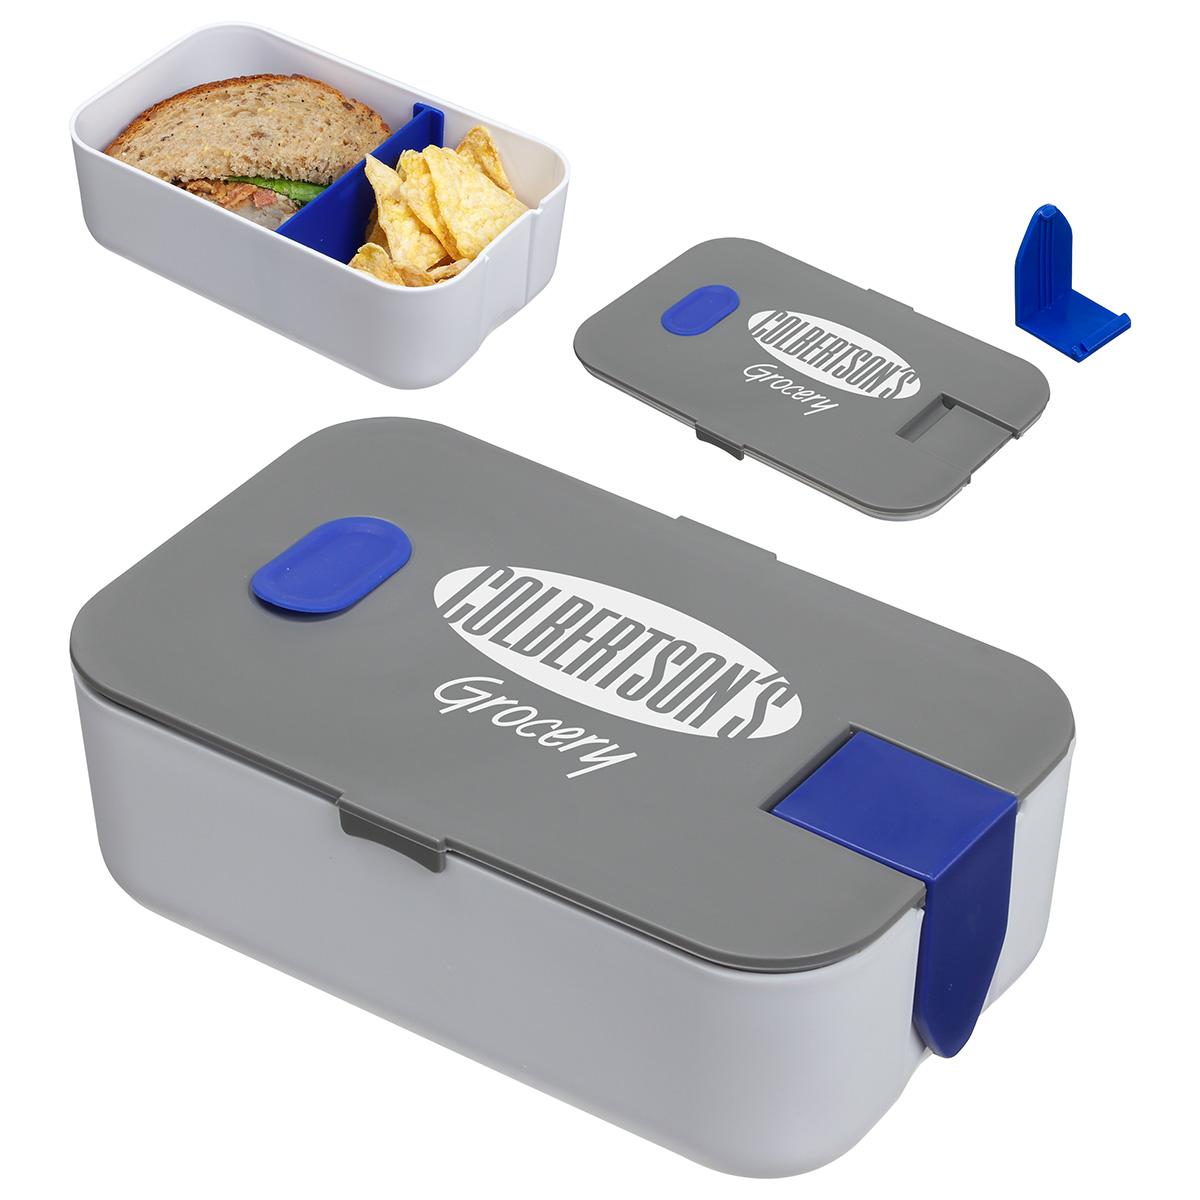 Big Munch Lunch Box, WKA-BM18, 1 Colour Imprint